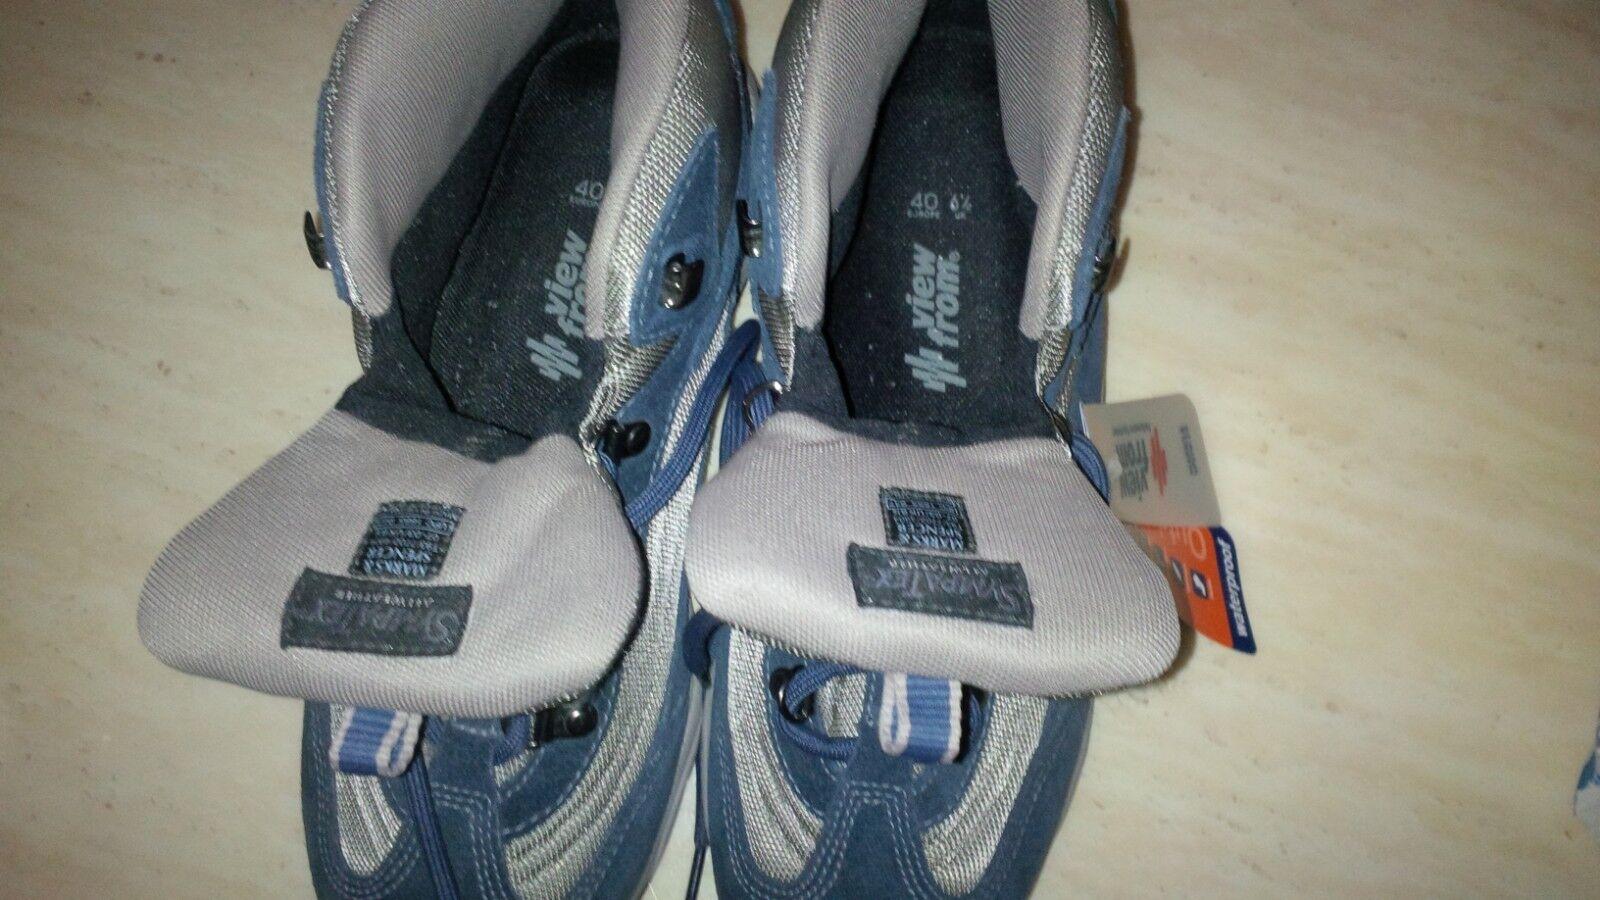 Waterproof walking  Hiking unisex boots  size 6..5 UK FREE POST GREAT GIFT